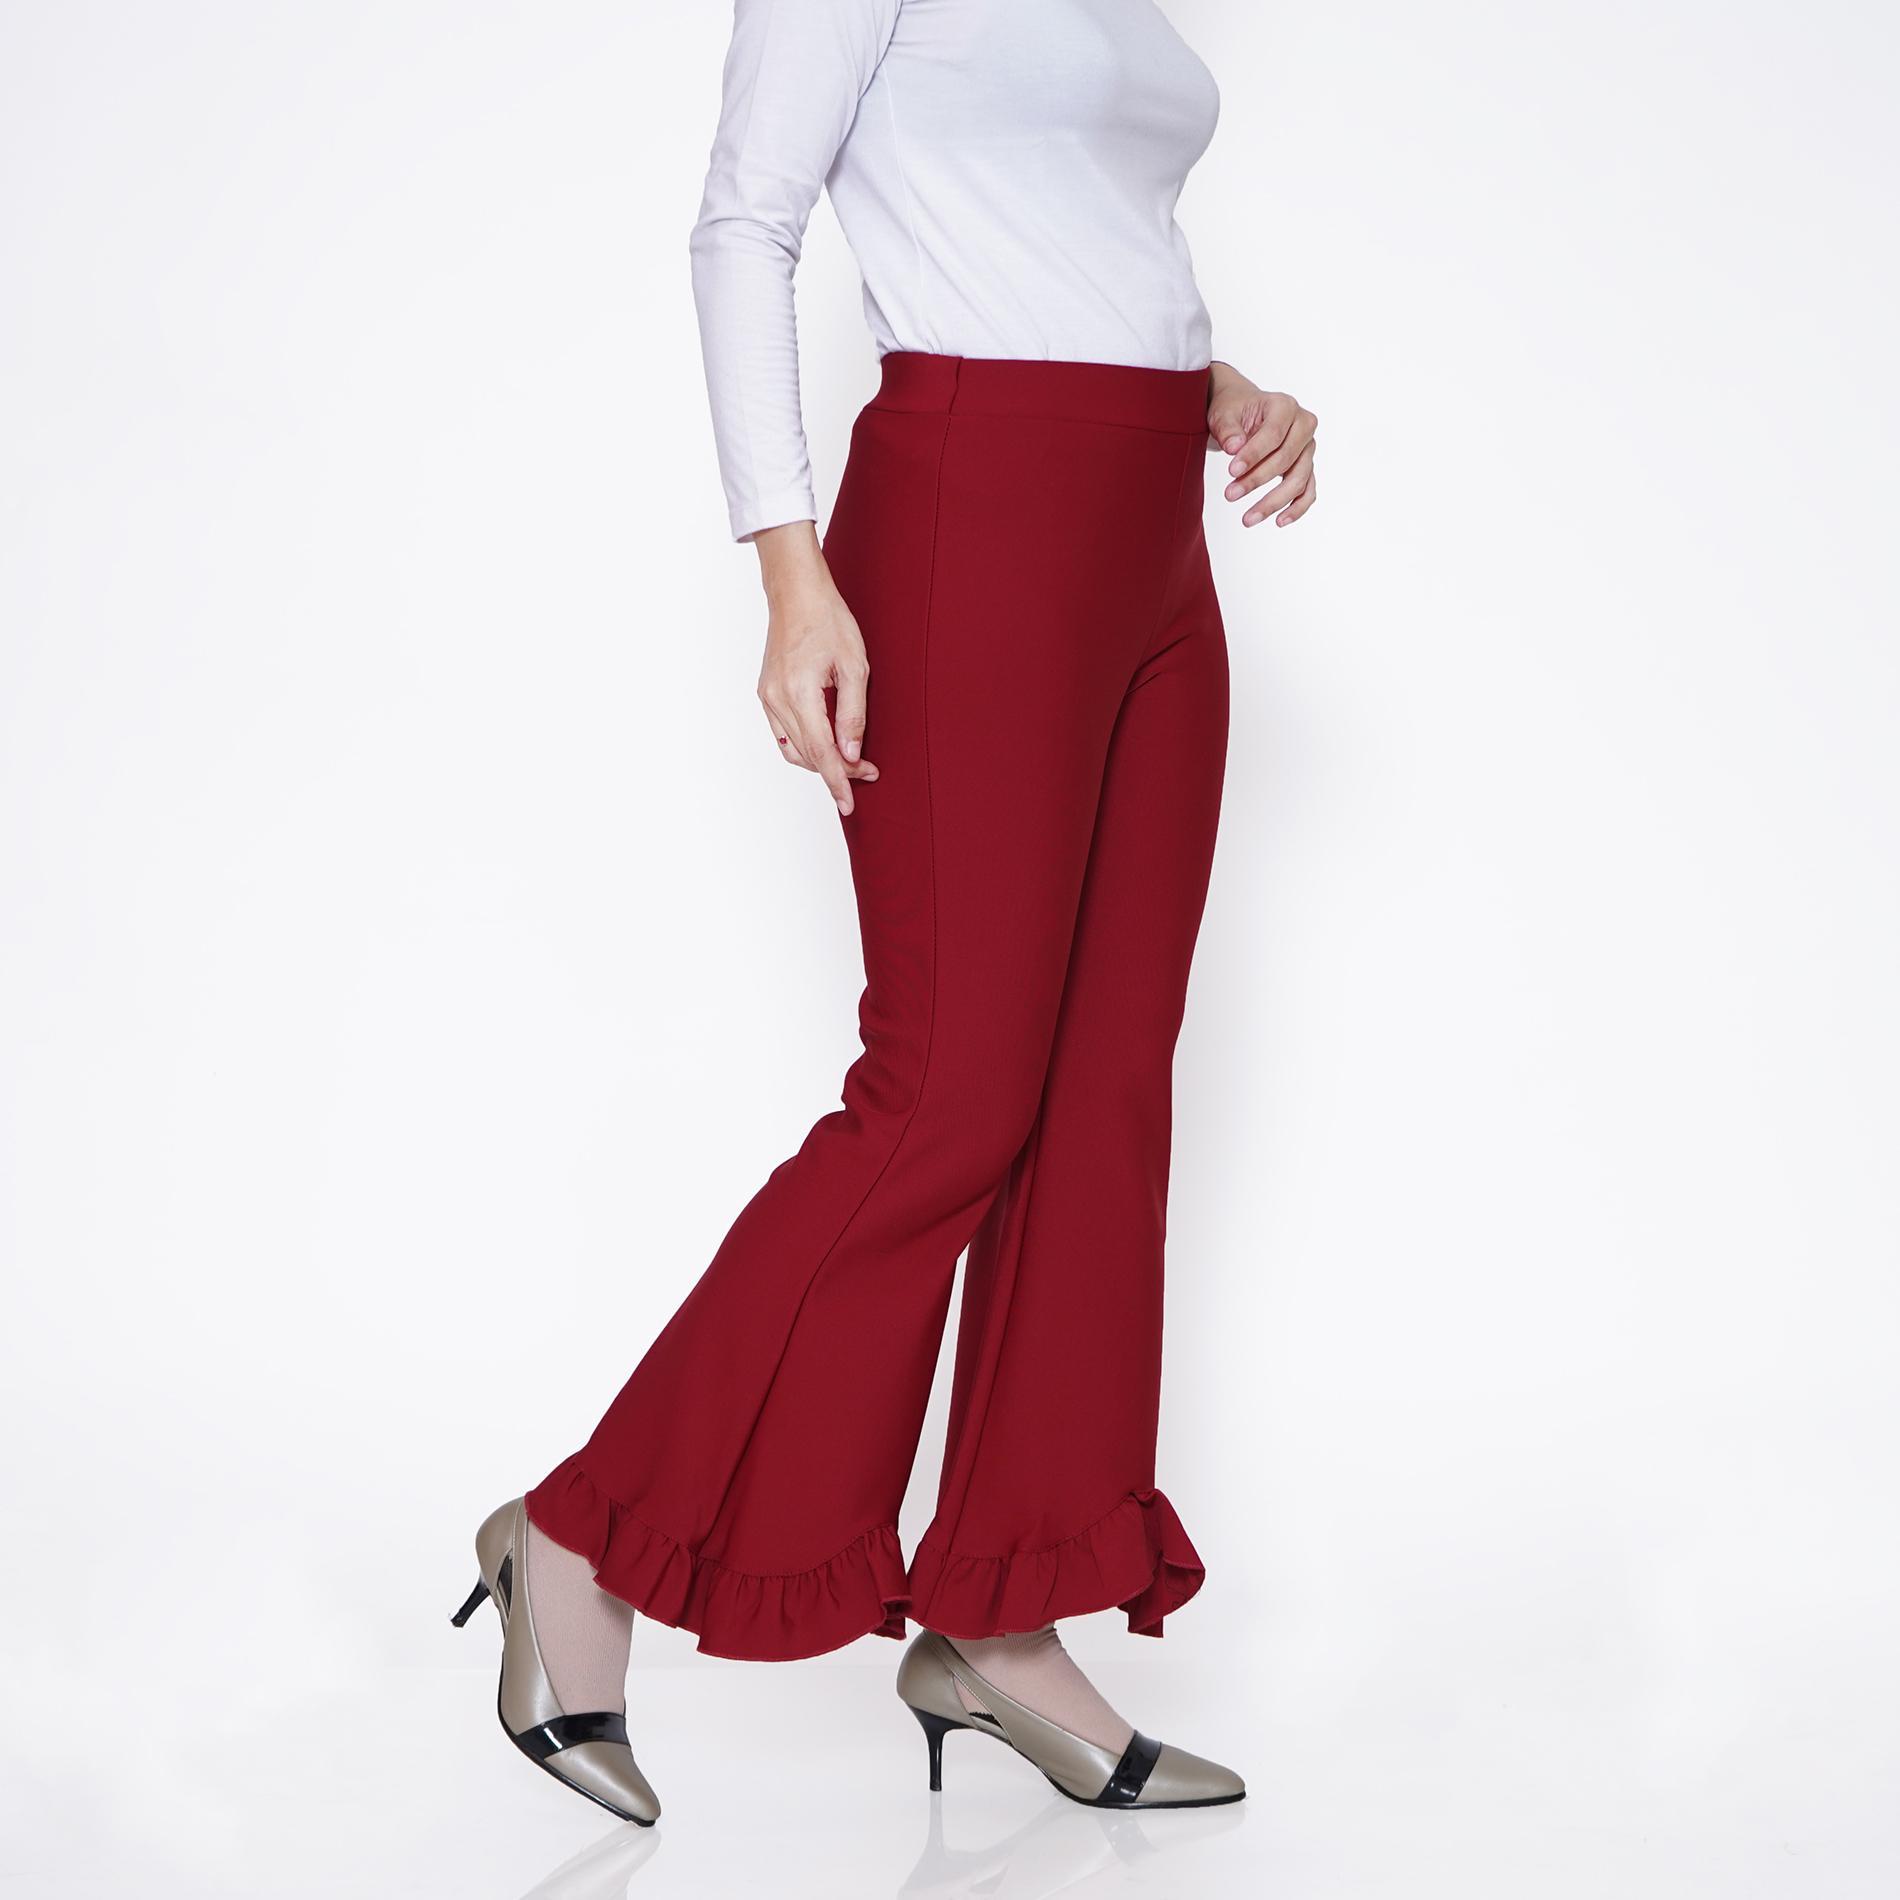 haymeestore celana haigwaist cutbray office pants import bawahan cutbrai wanita celana premium scuba cewek